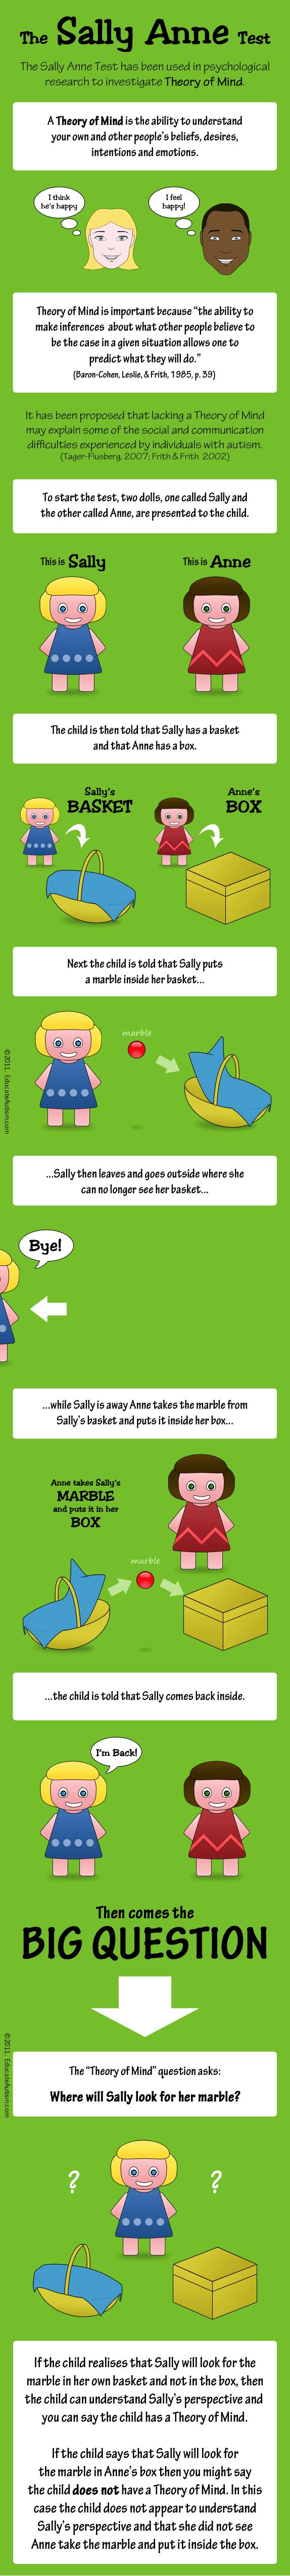 sally-anne-test-educate-autism.jpg